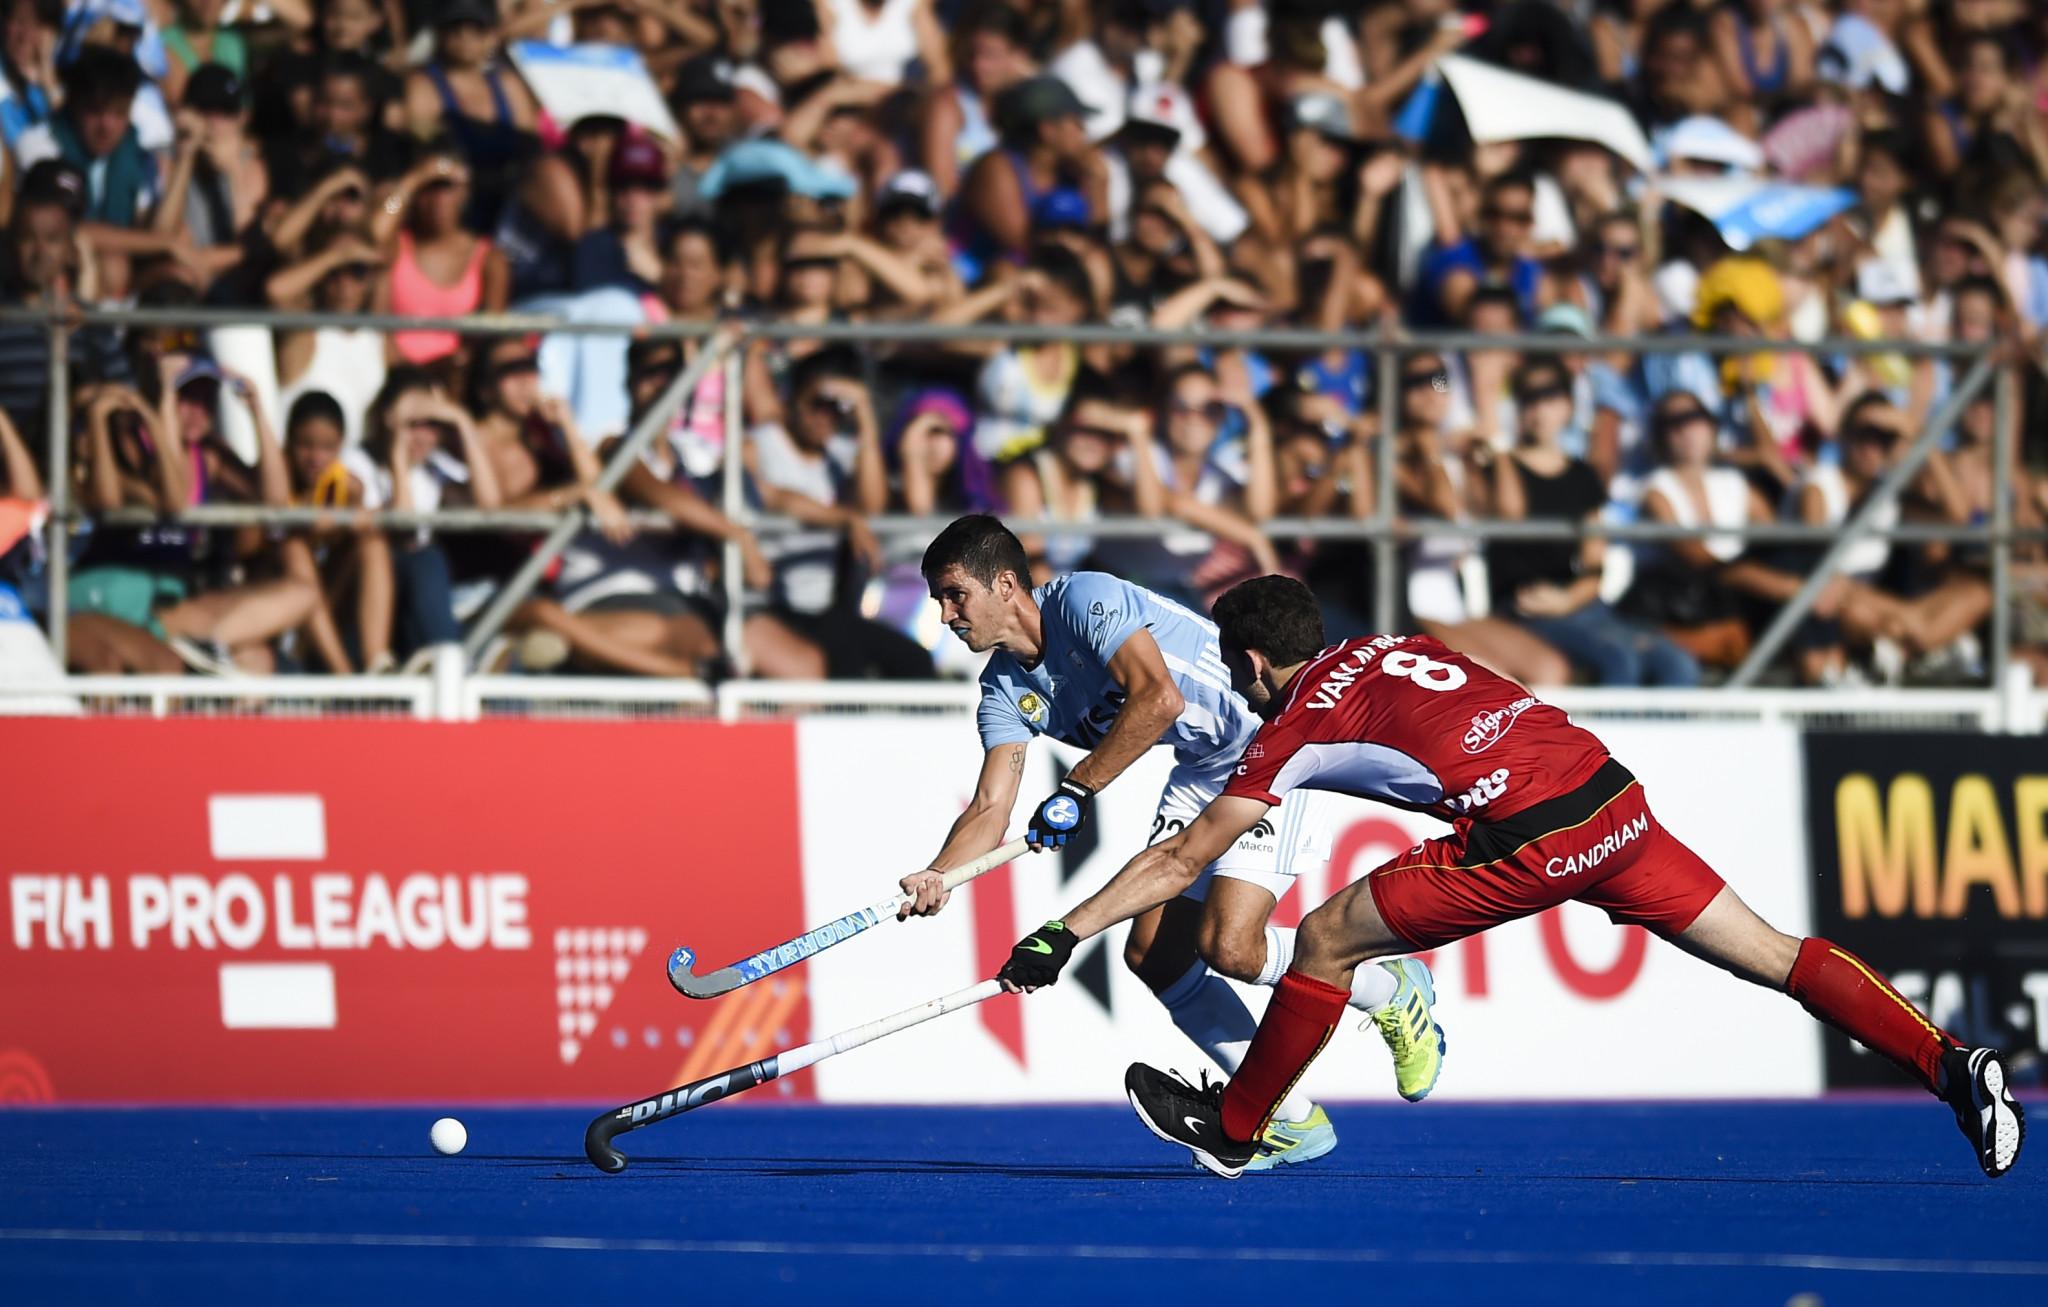 Belgium beat Argentina in repeat of Rio 2016 men's final in FIH Pro League